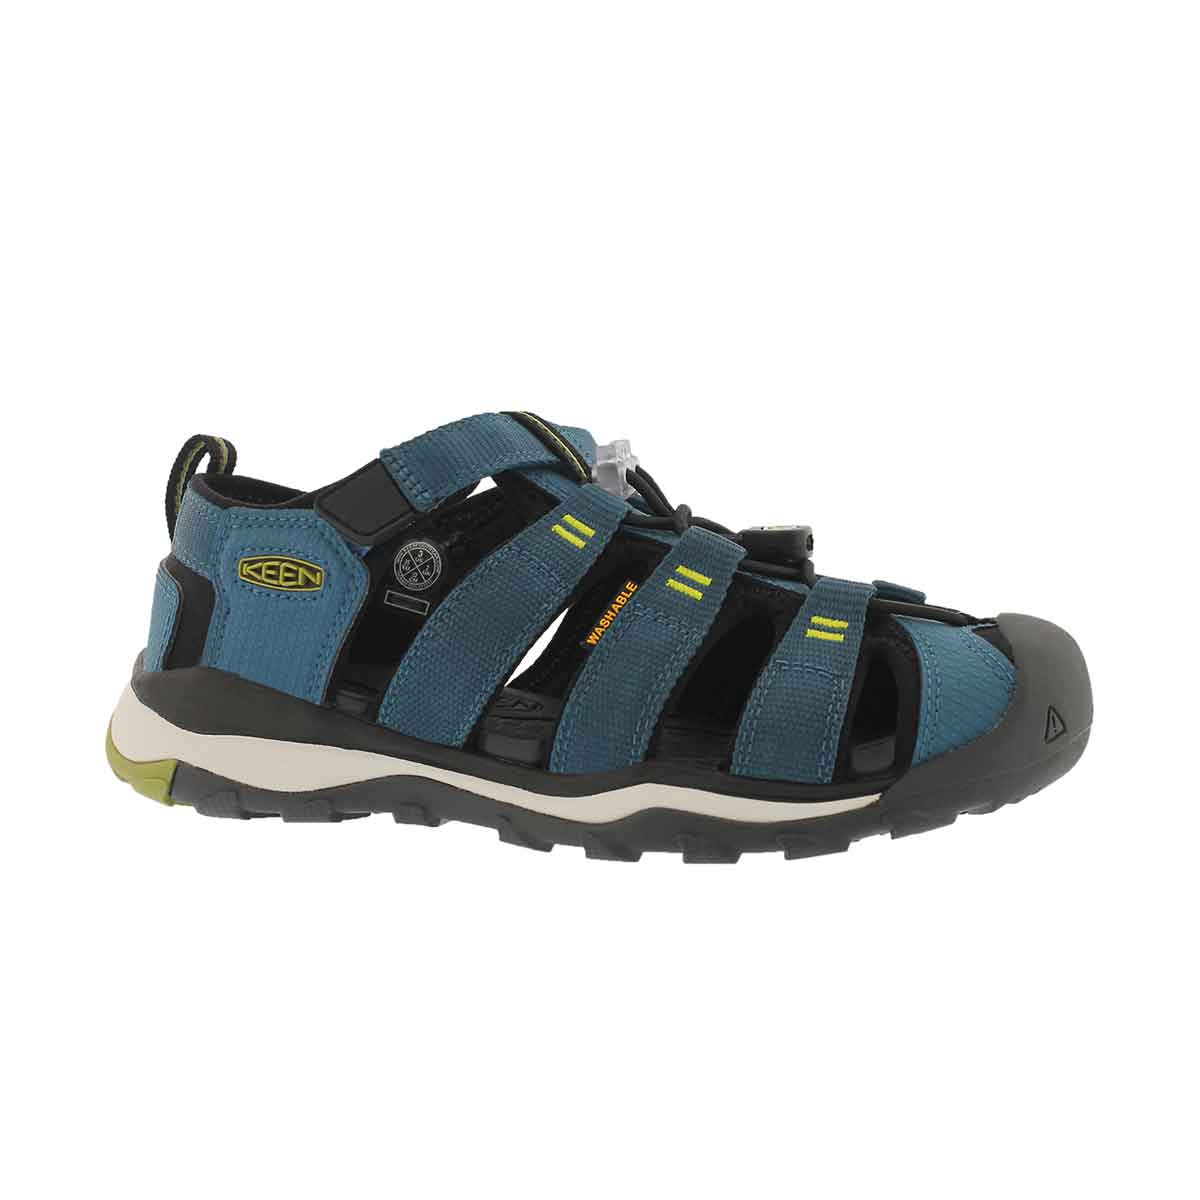 Boys' NEWPORT NEO H2 legion blu/moss sandals